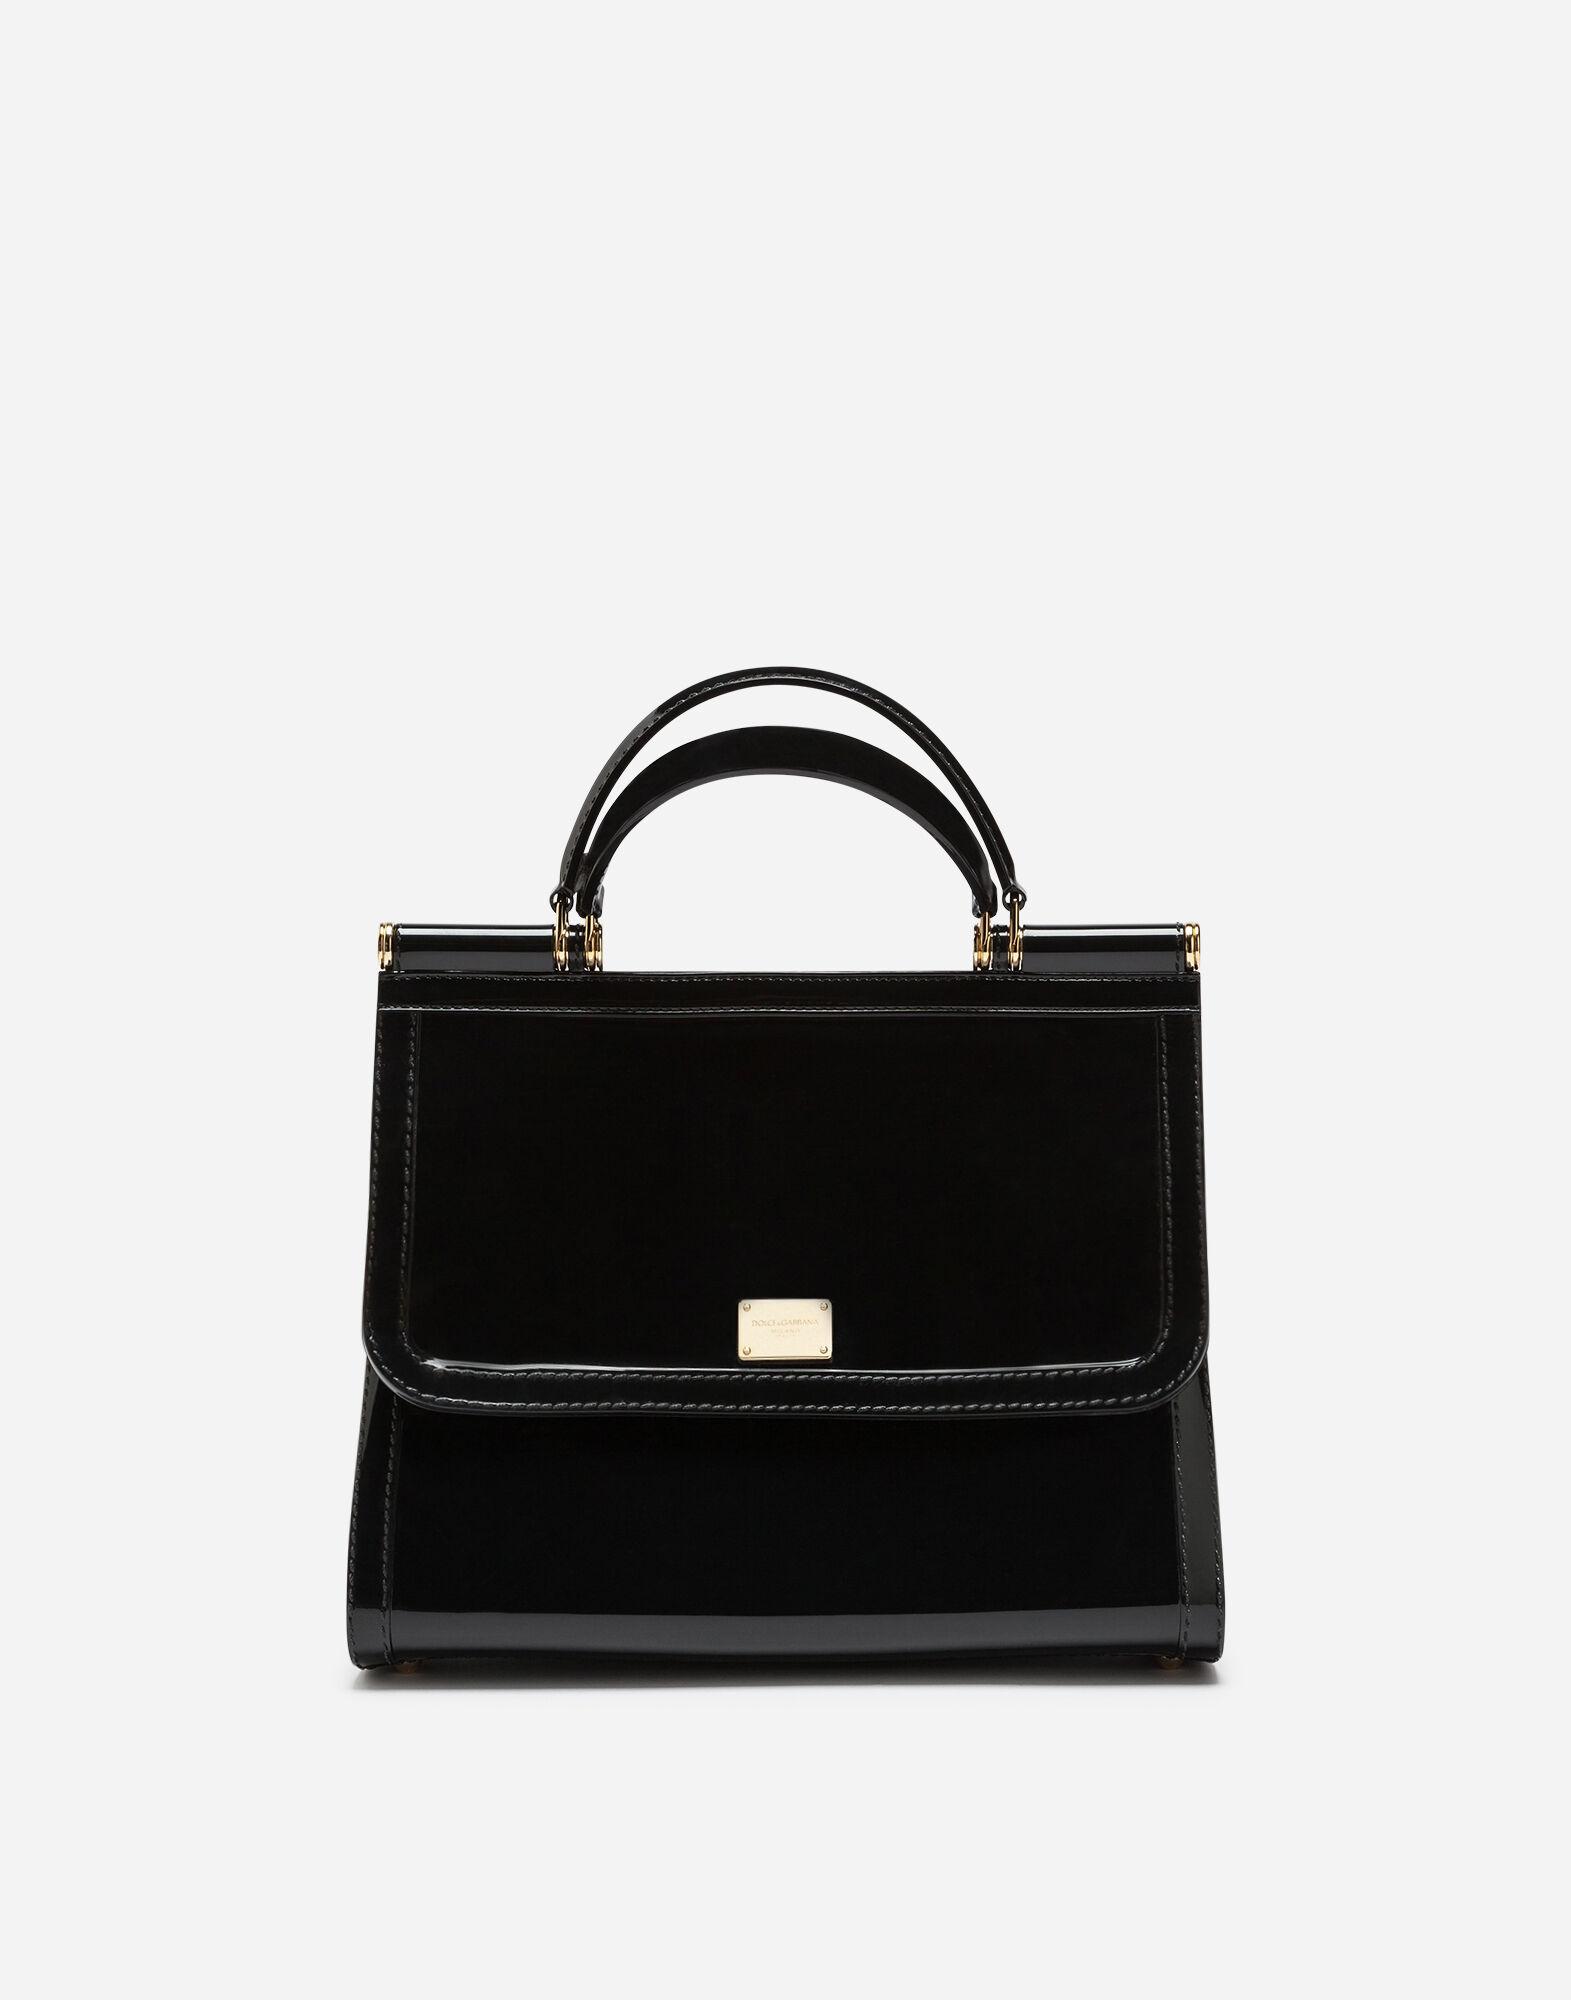 Dolce & Gabbana Clutch Bag On Sale, Black, PVC, 2017, one size